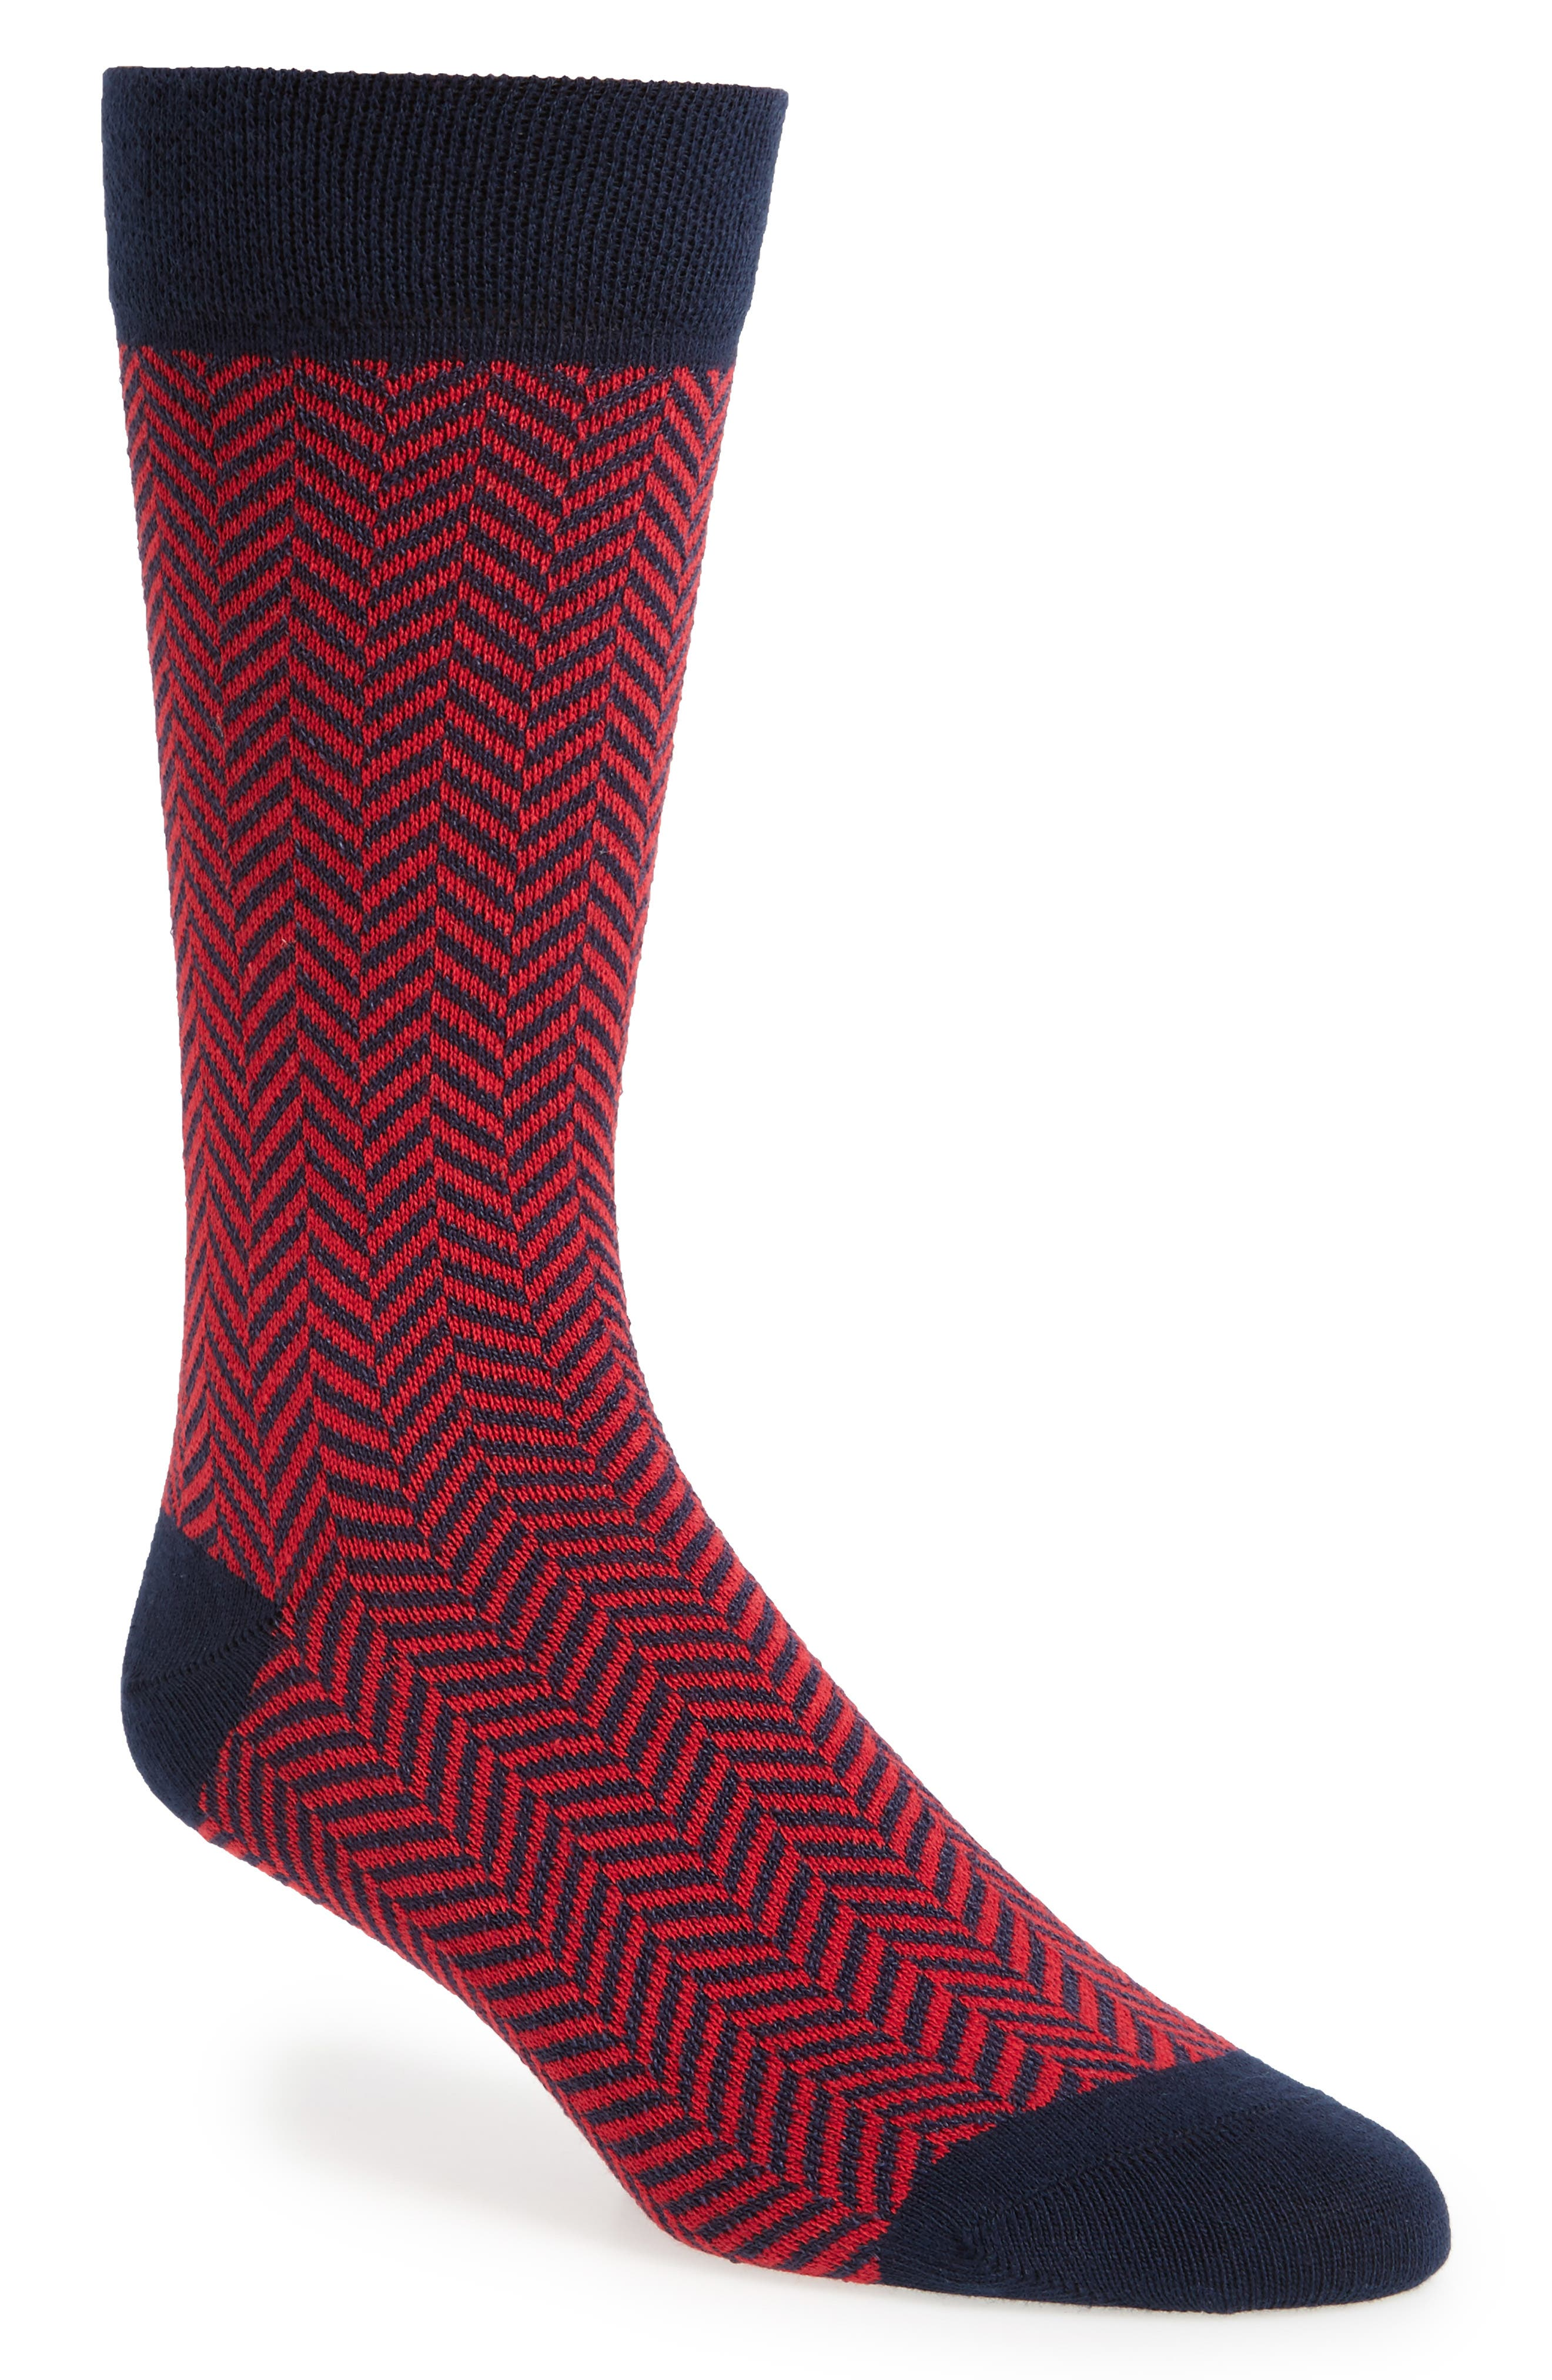 Ronimow Herringbone Socks,                         Main,                         color, Red